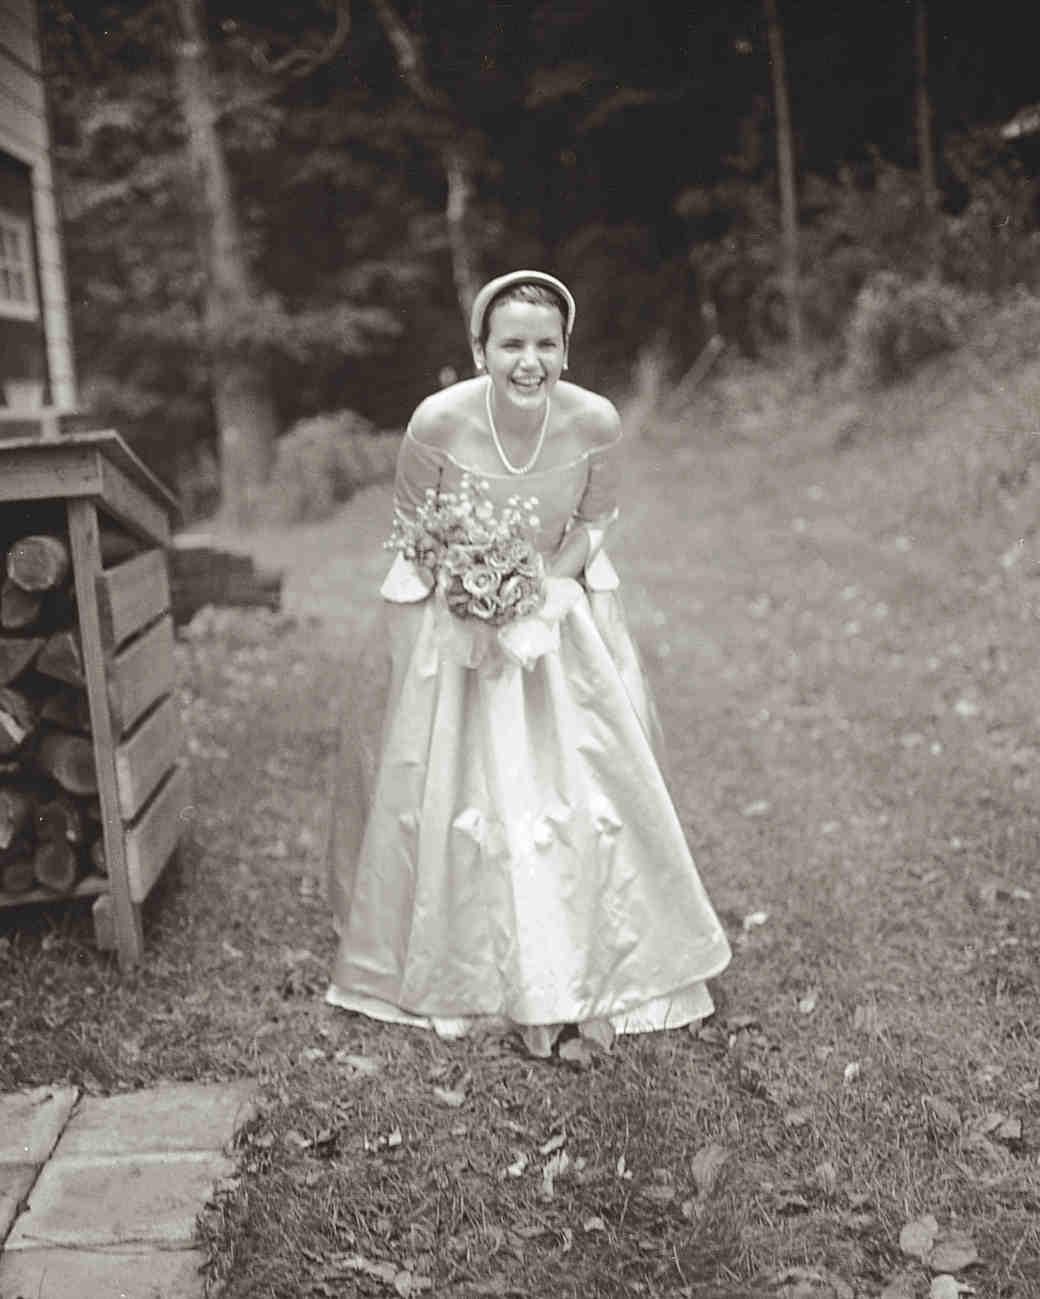 john-dolan-wedding-photographer-winter-spring-1998-0914.jpg